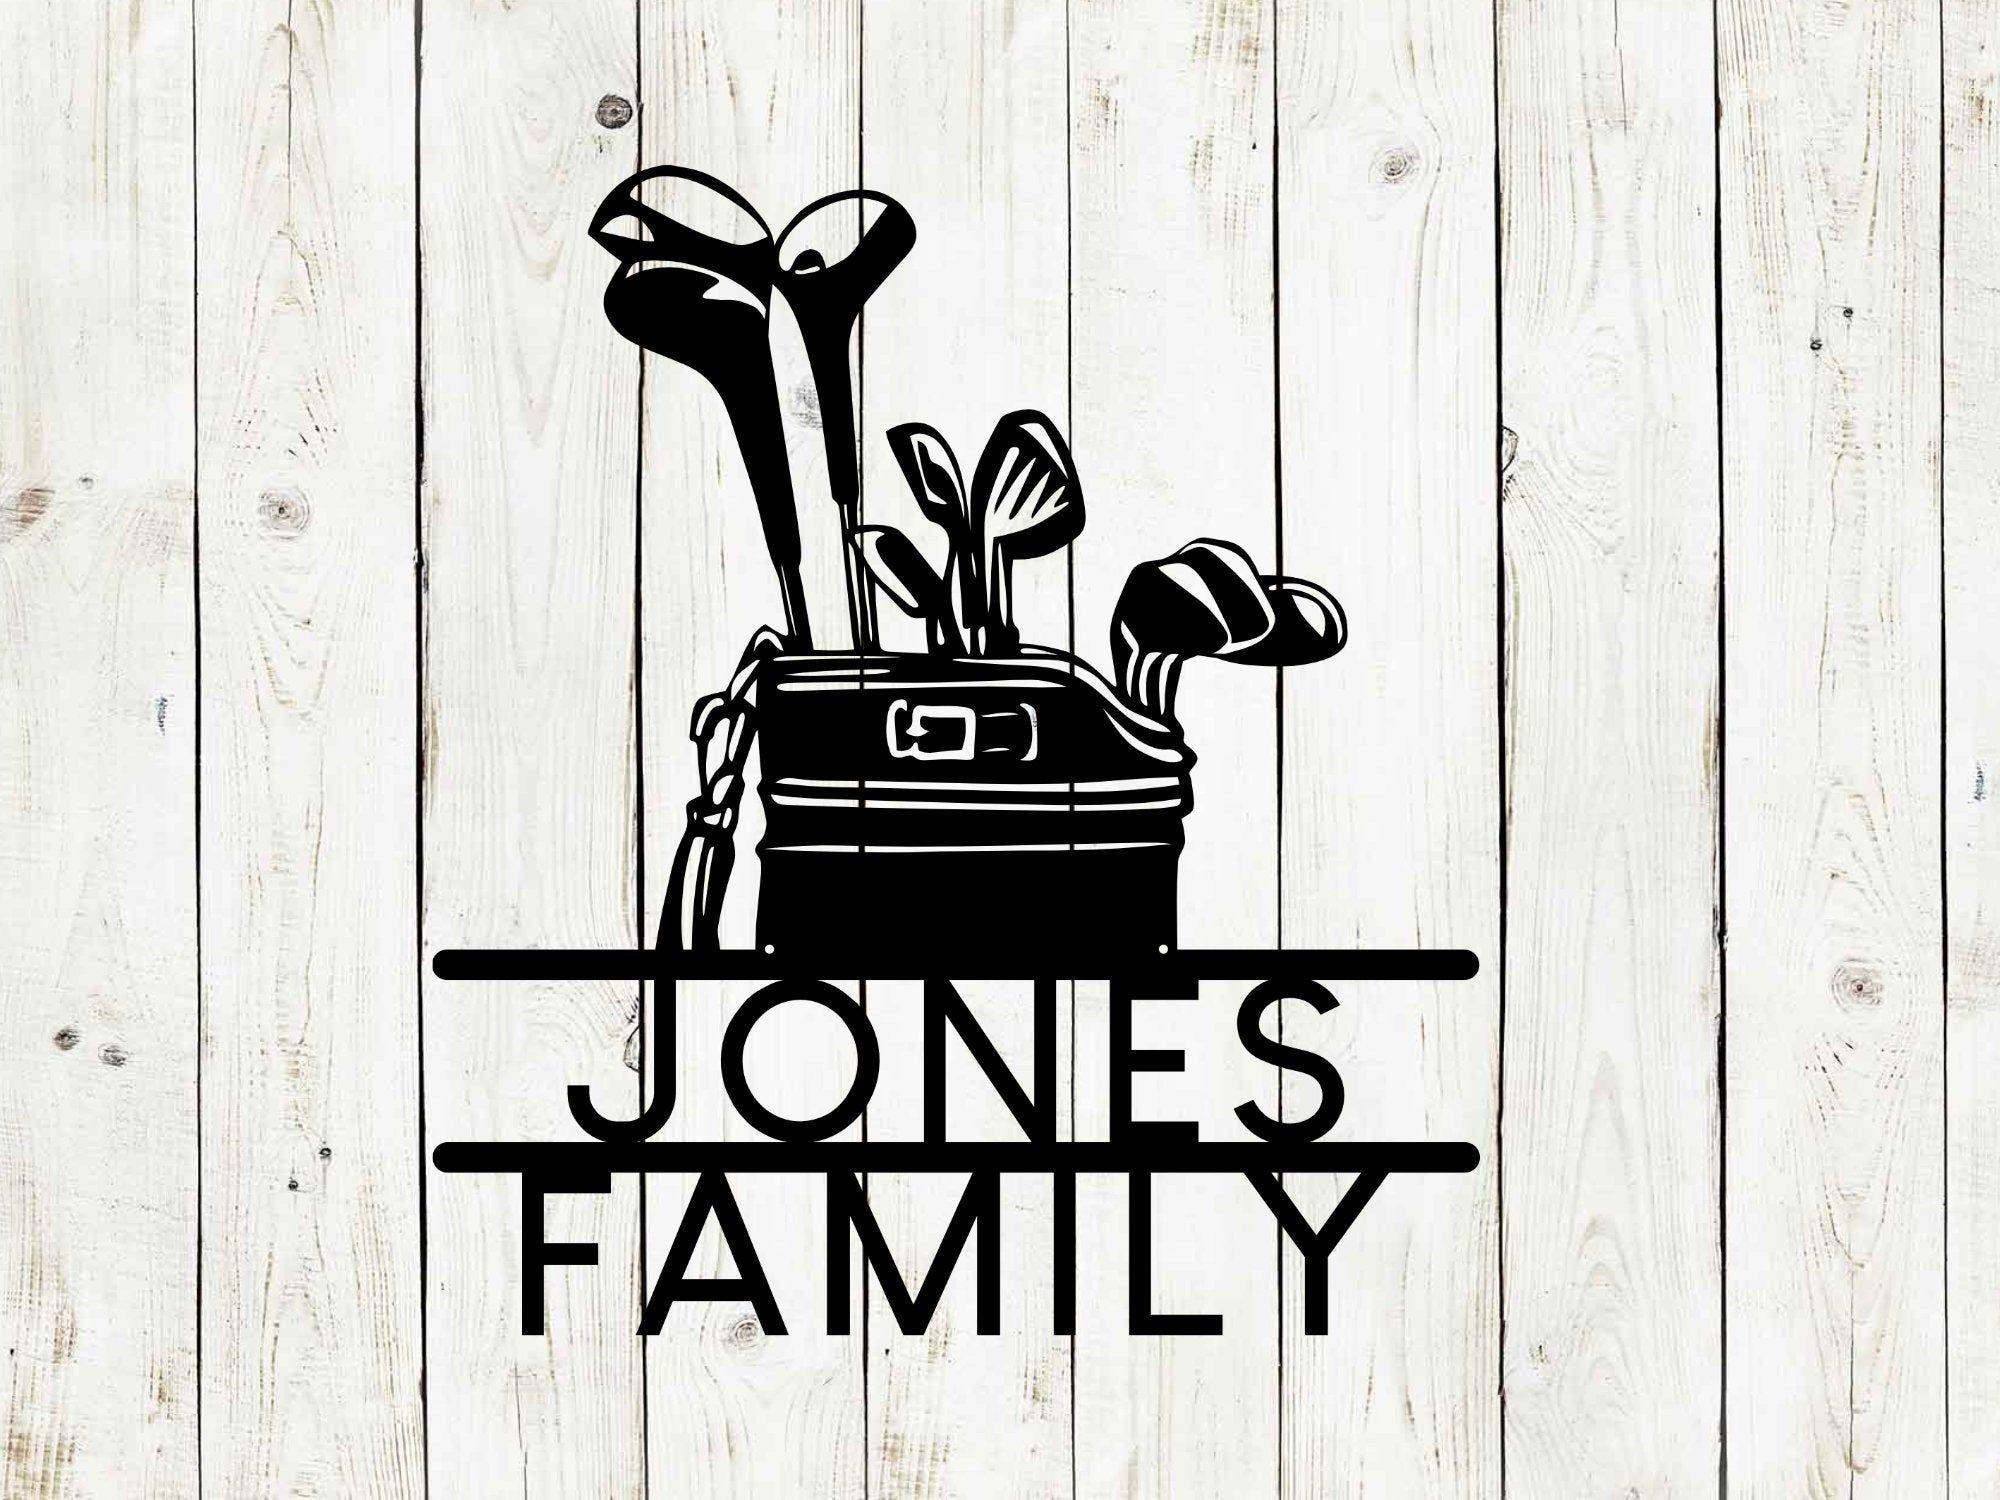 Golf Bag Custom Name Metal Sign, Golf Sign, Bar Sign, 19th Hole, Custom Golf Sign, Man Cave, Home Bar, Game Room Sign, Fathers Day,